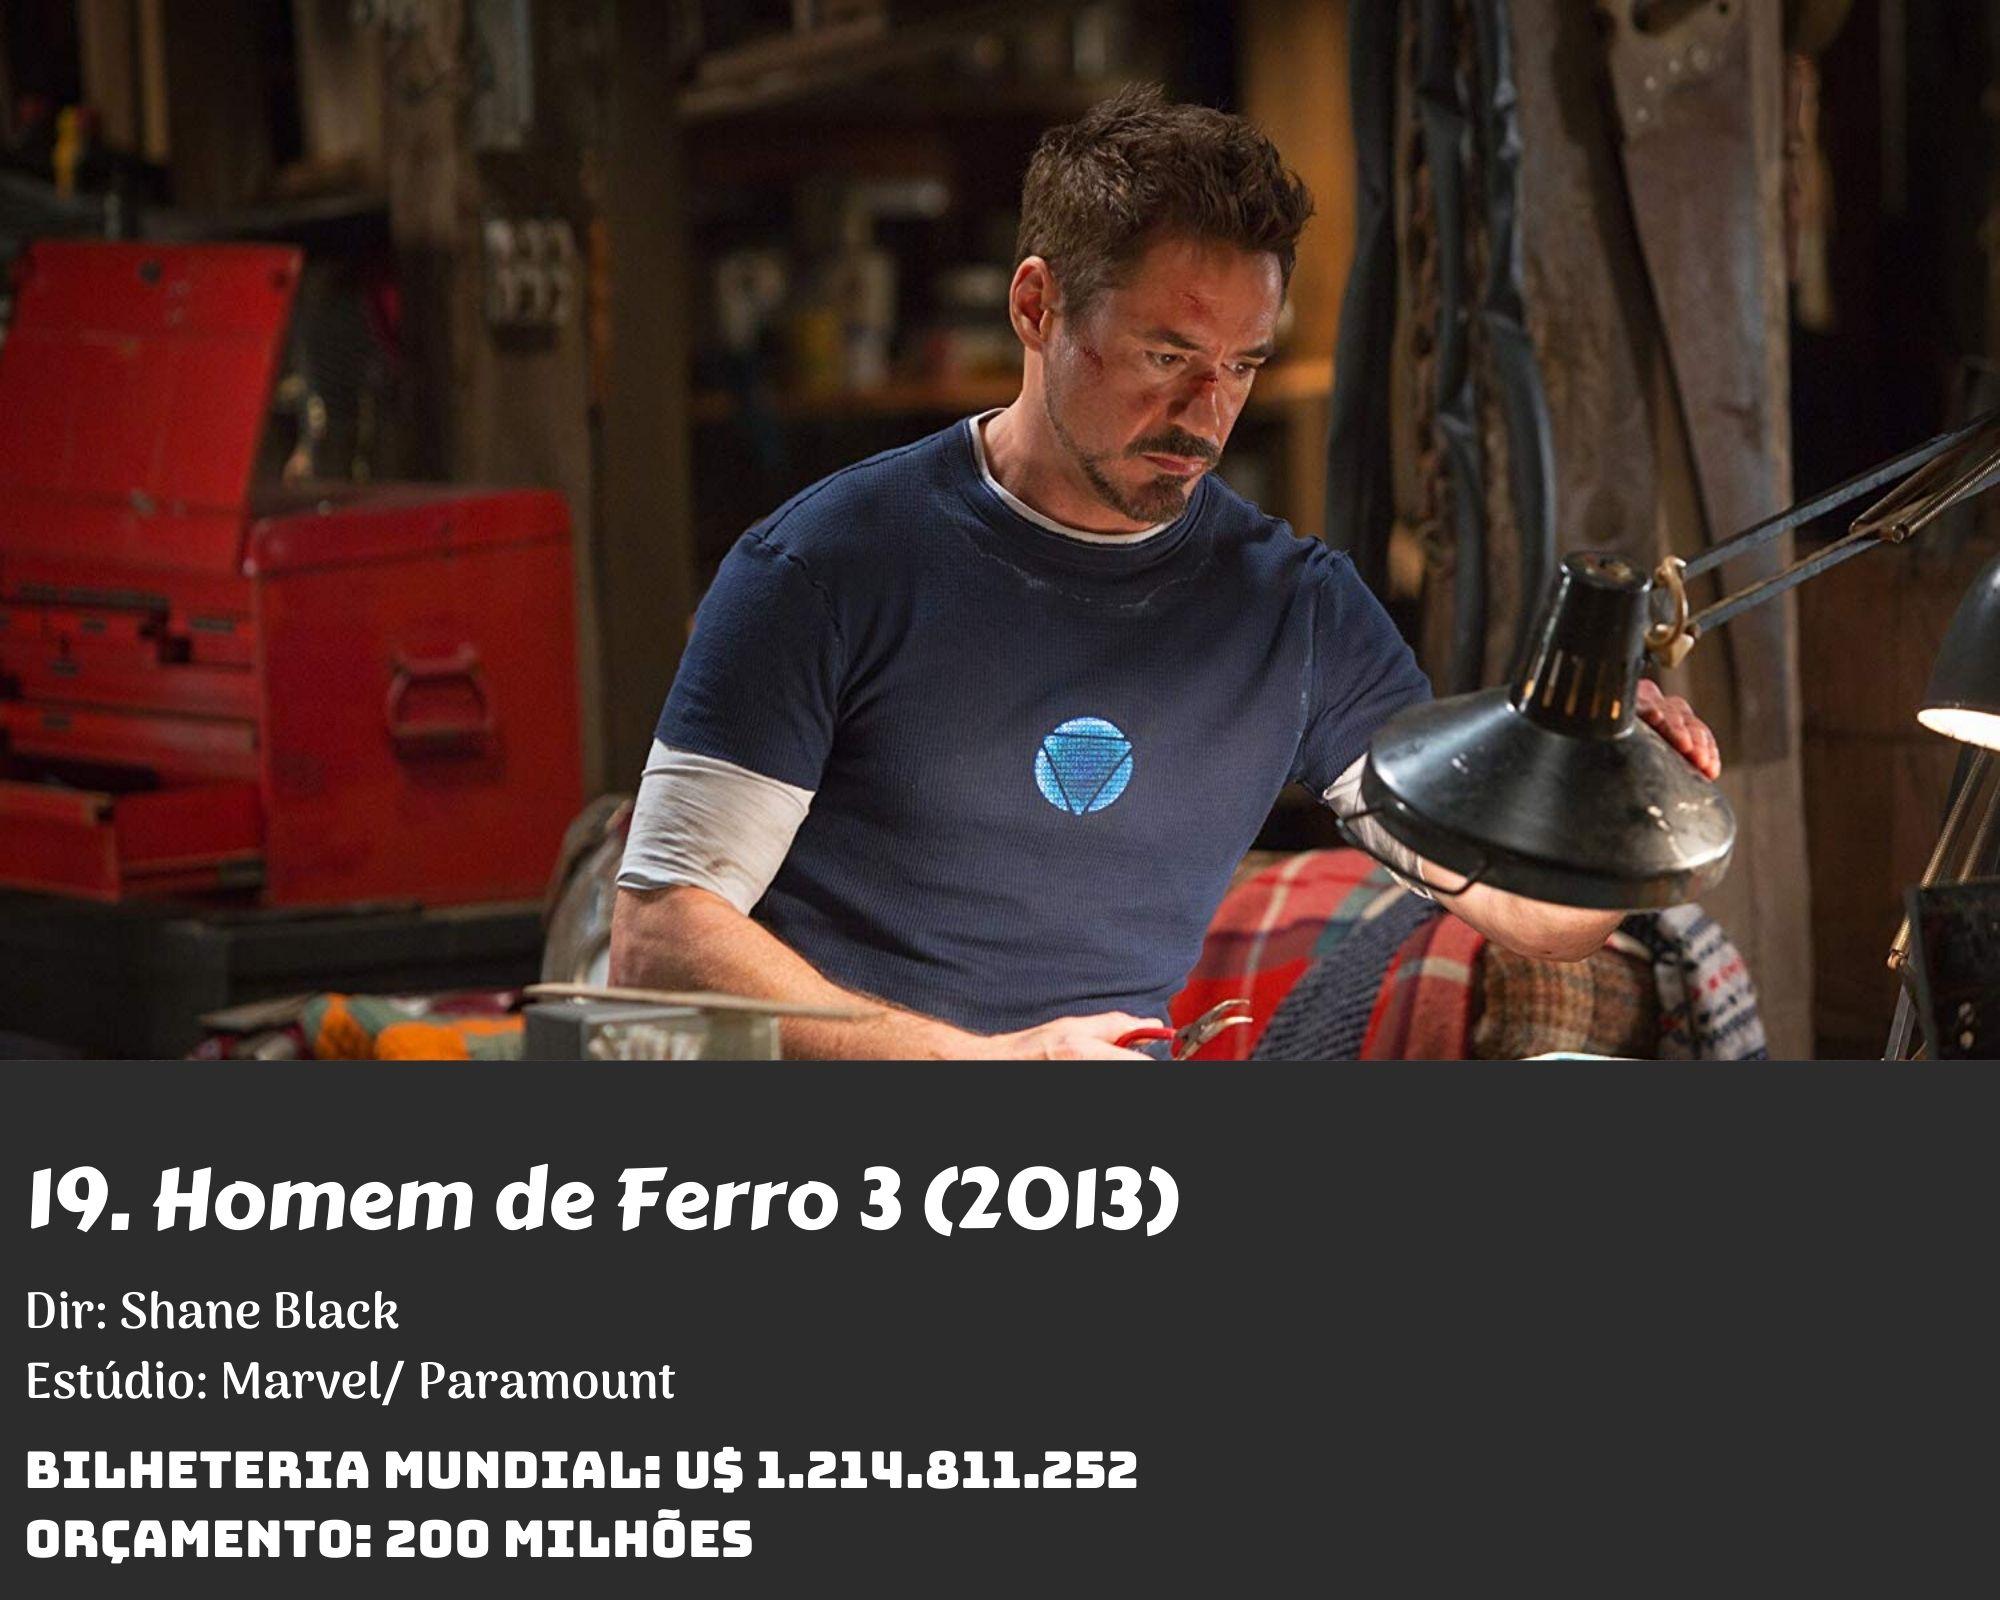 19. Iron Man 3